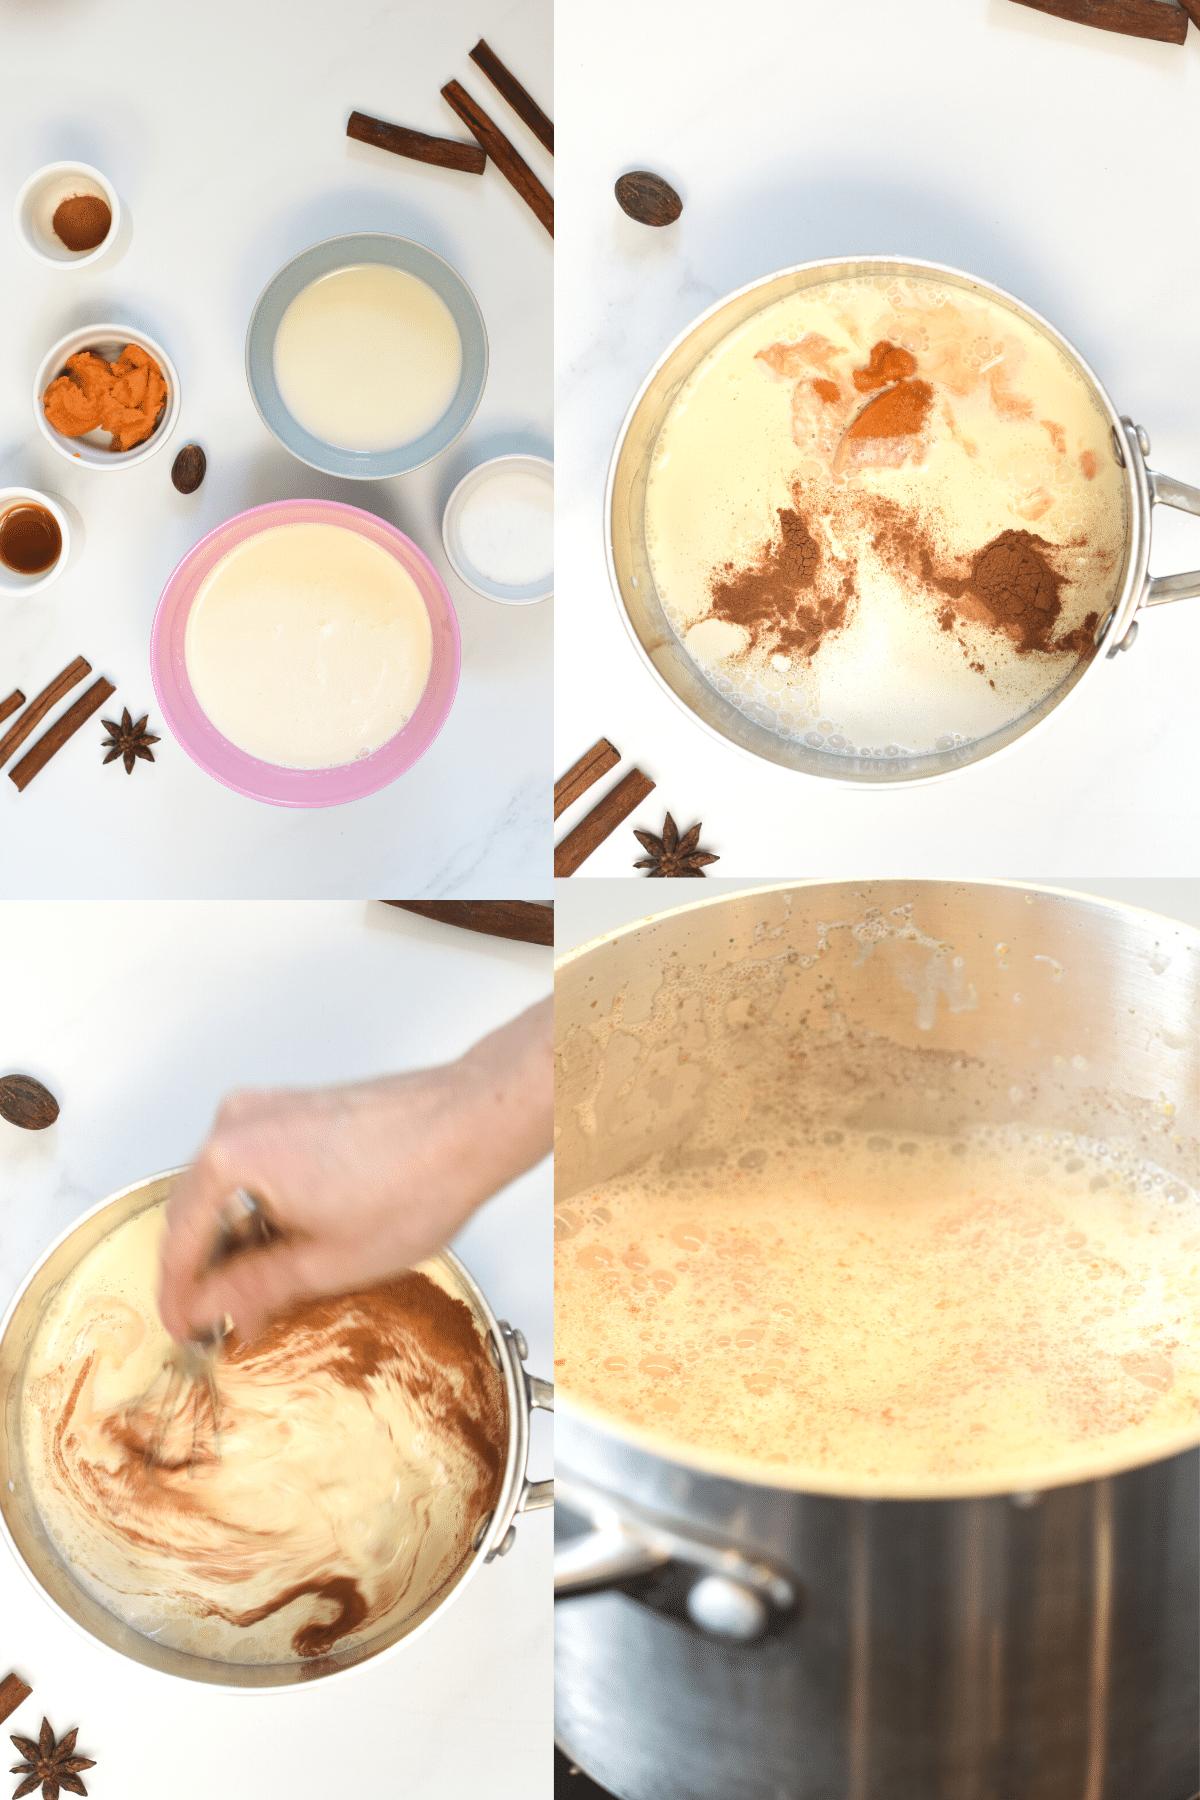 How to make Sugar Free Pumpkin Spice Creamer